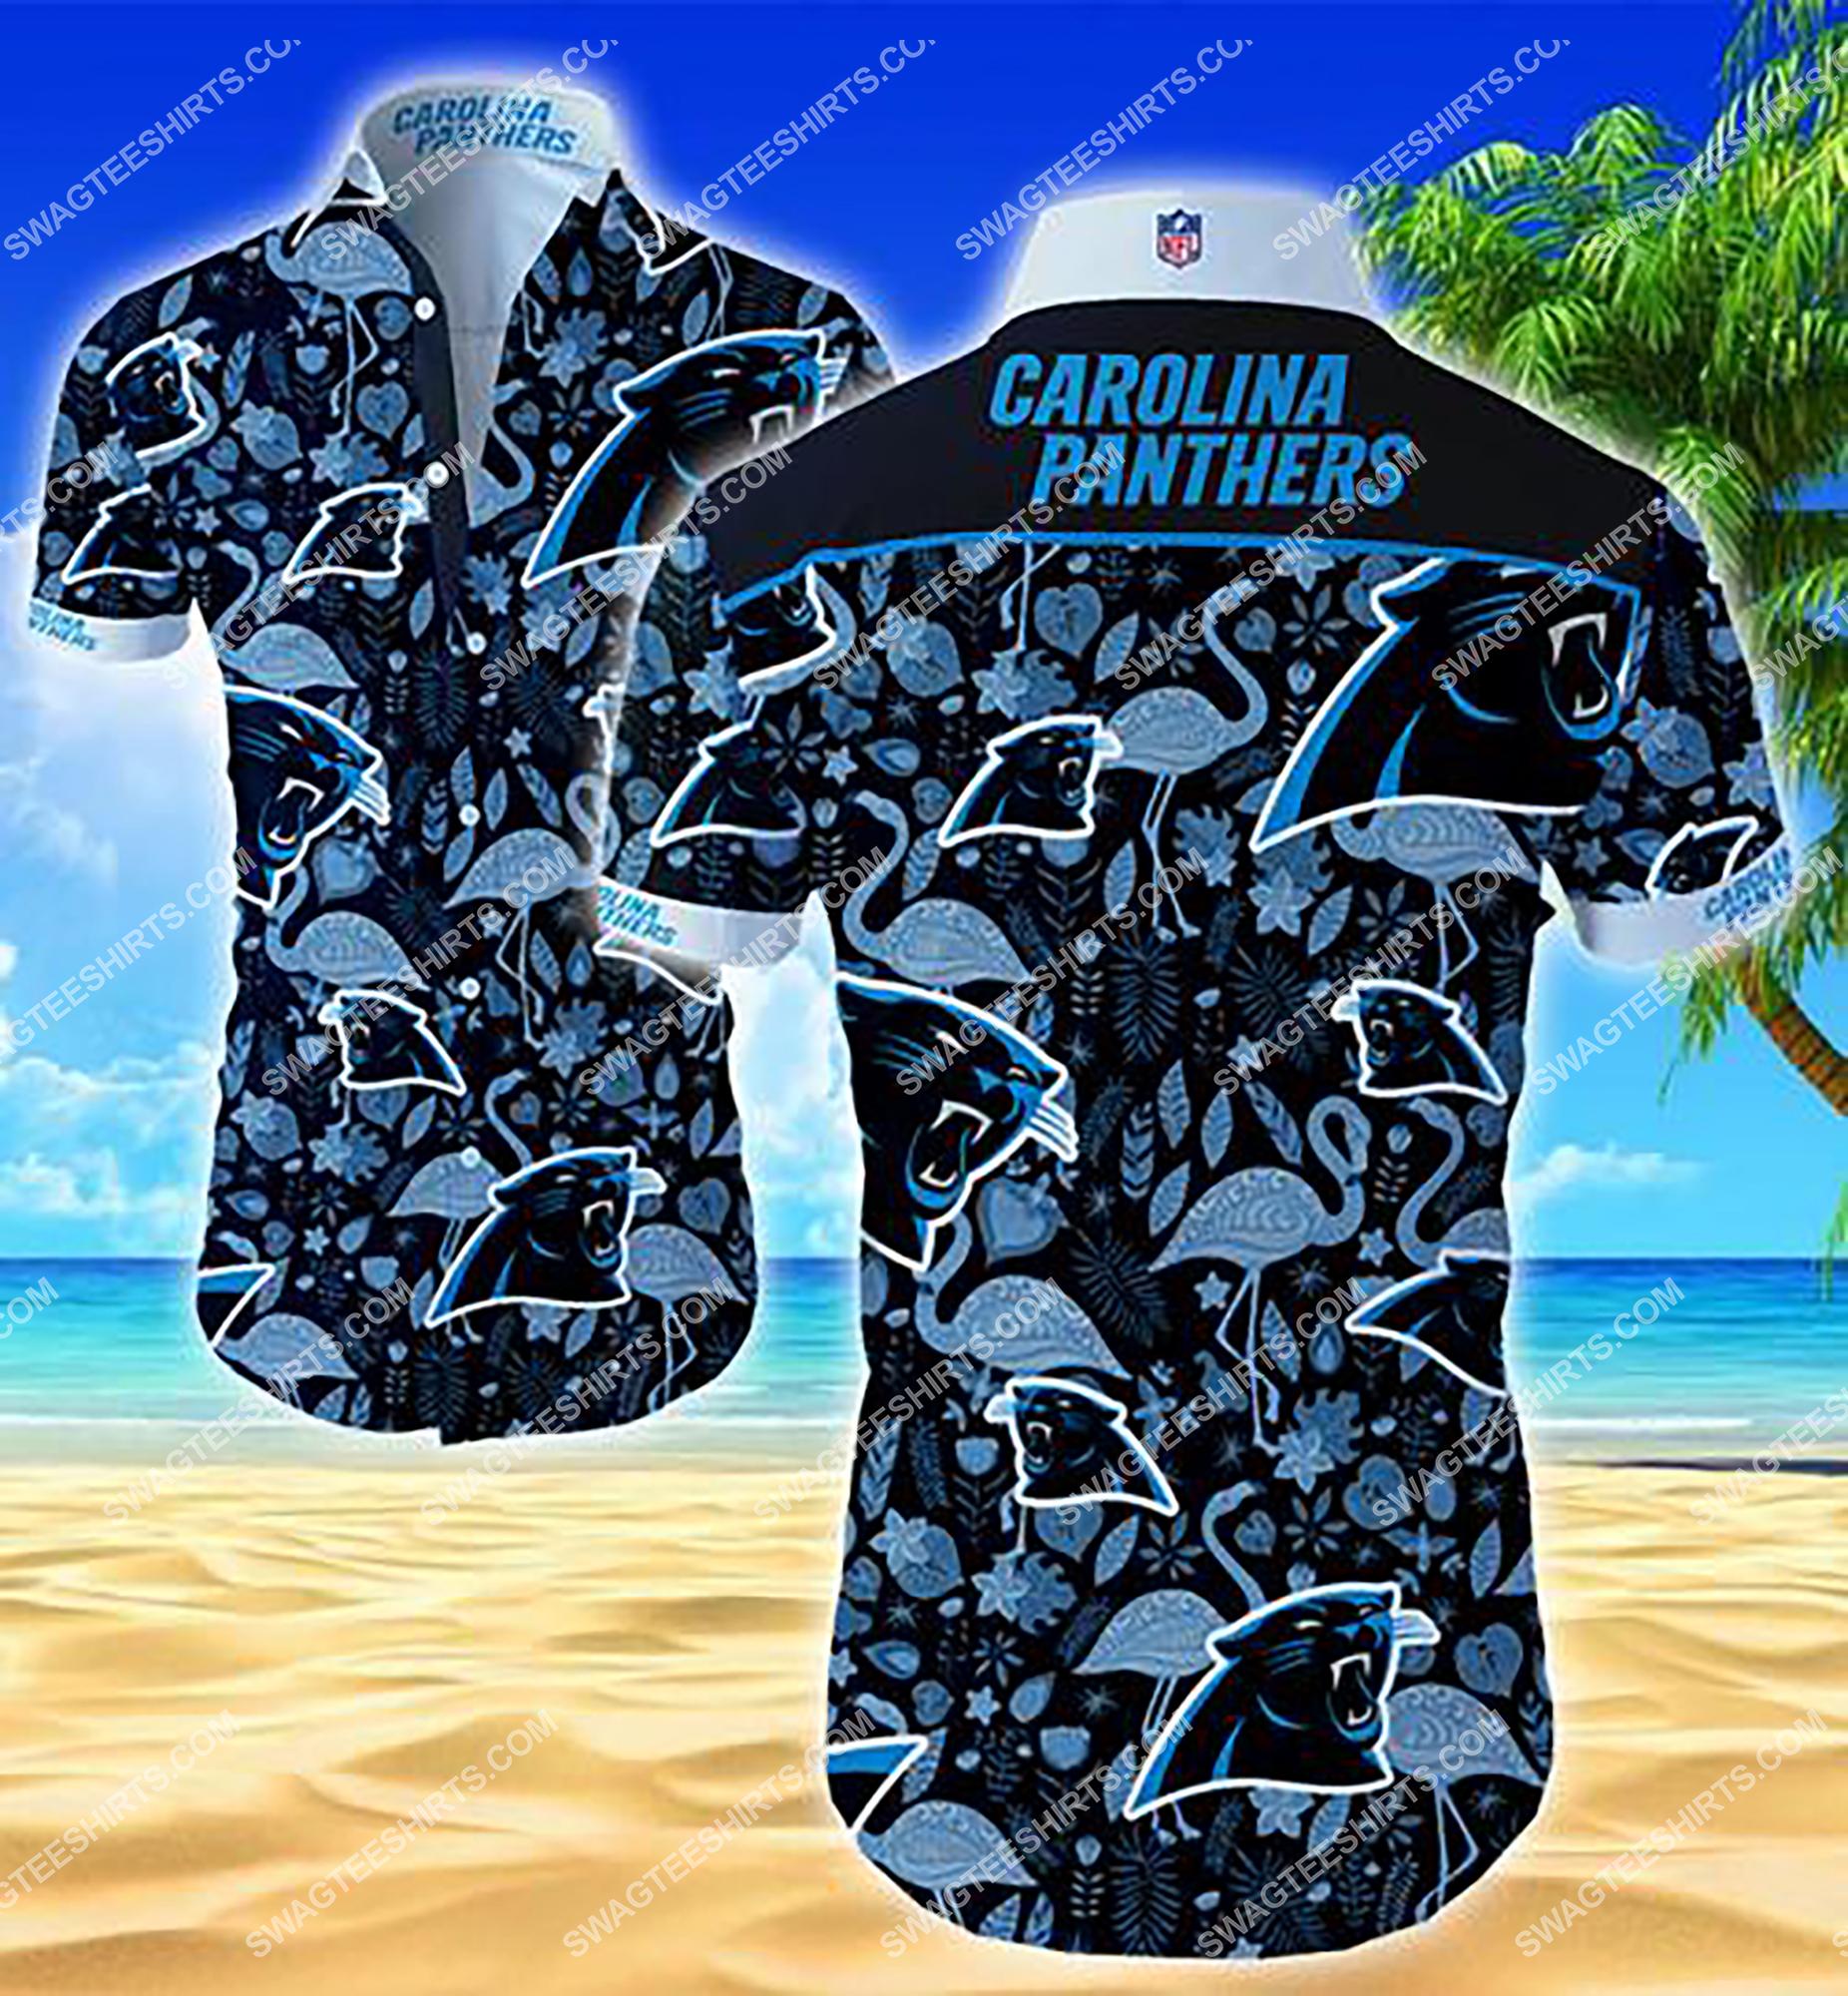 [highest selling] the carolina panthers football team summer hawaiian shirt - maria